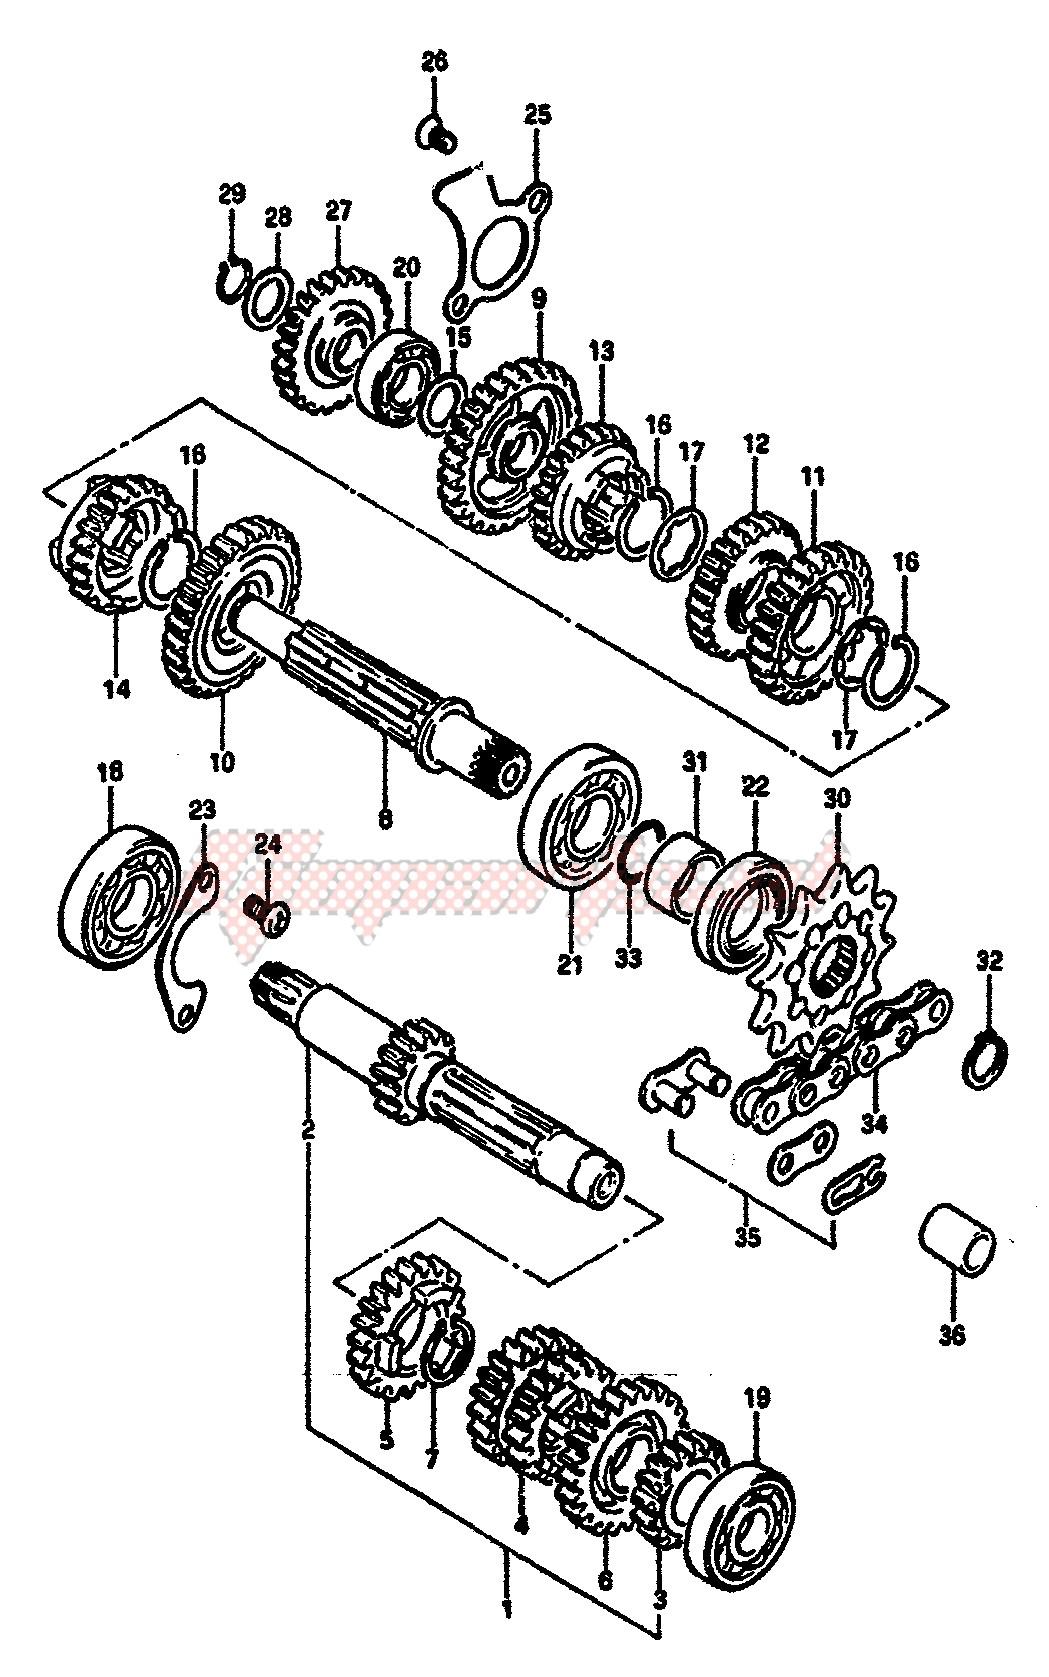 TRANSMISSION (MODEL E) blueprint